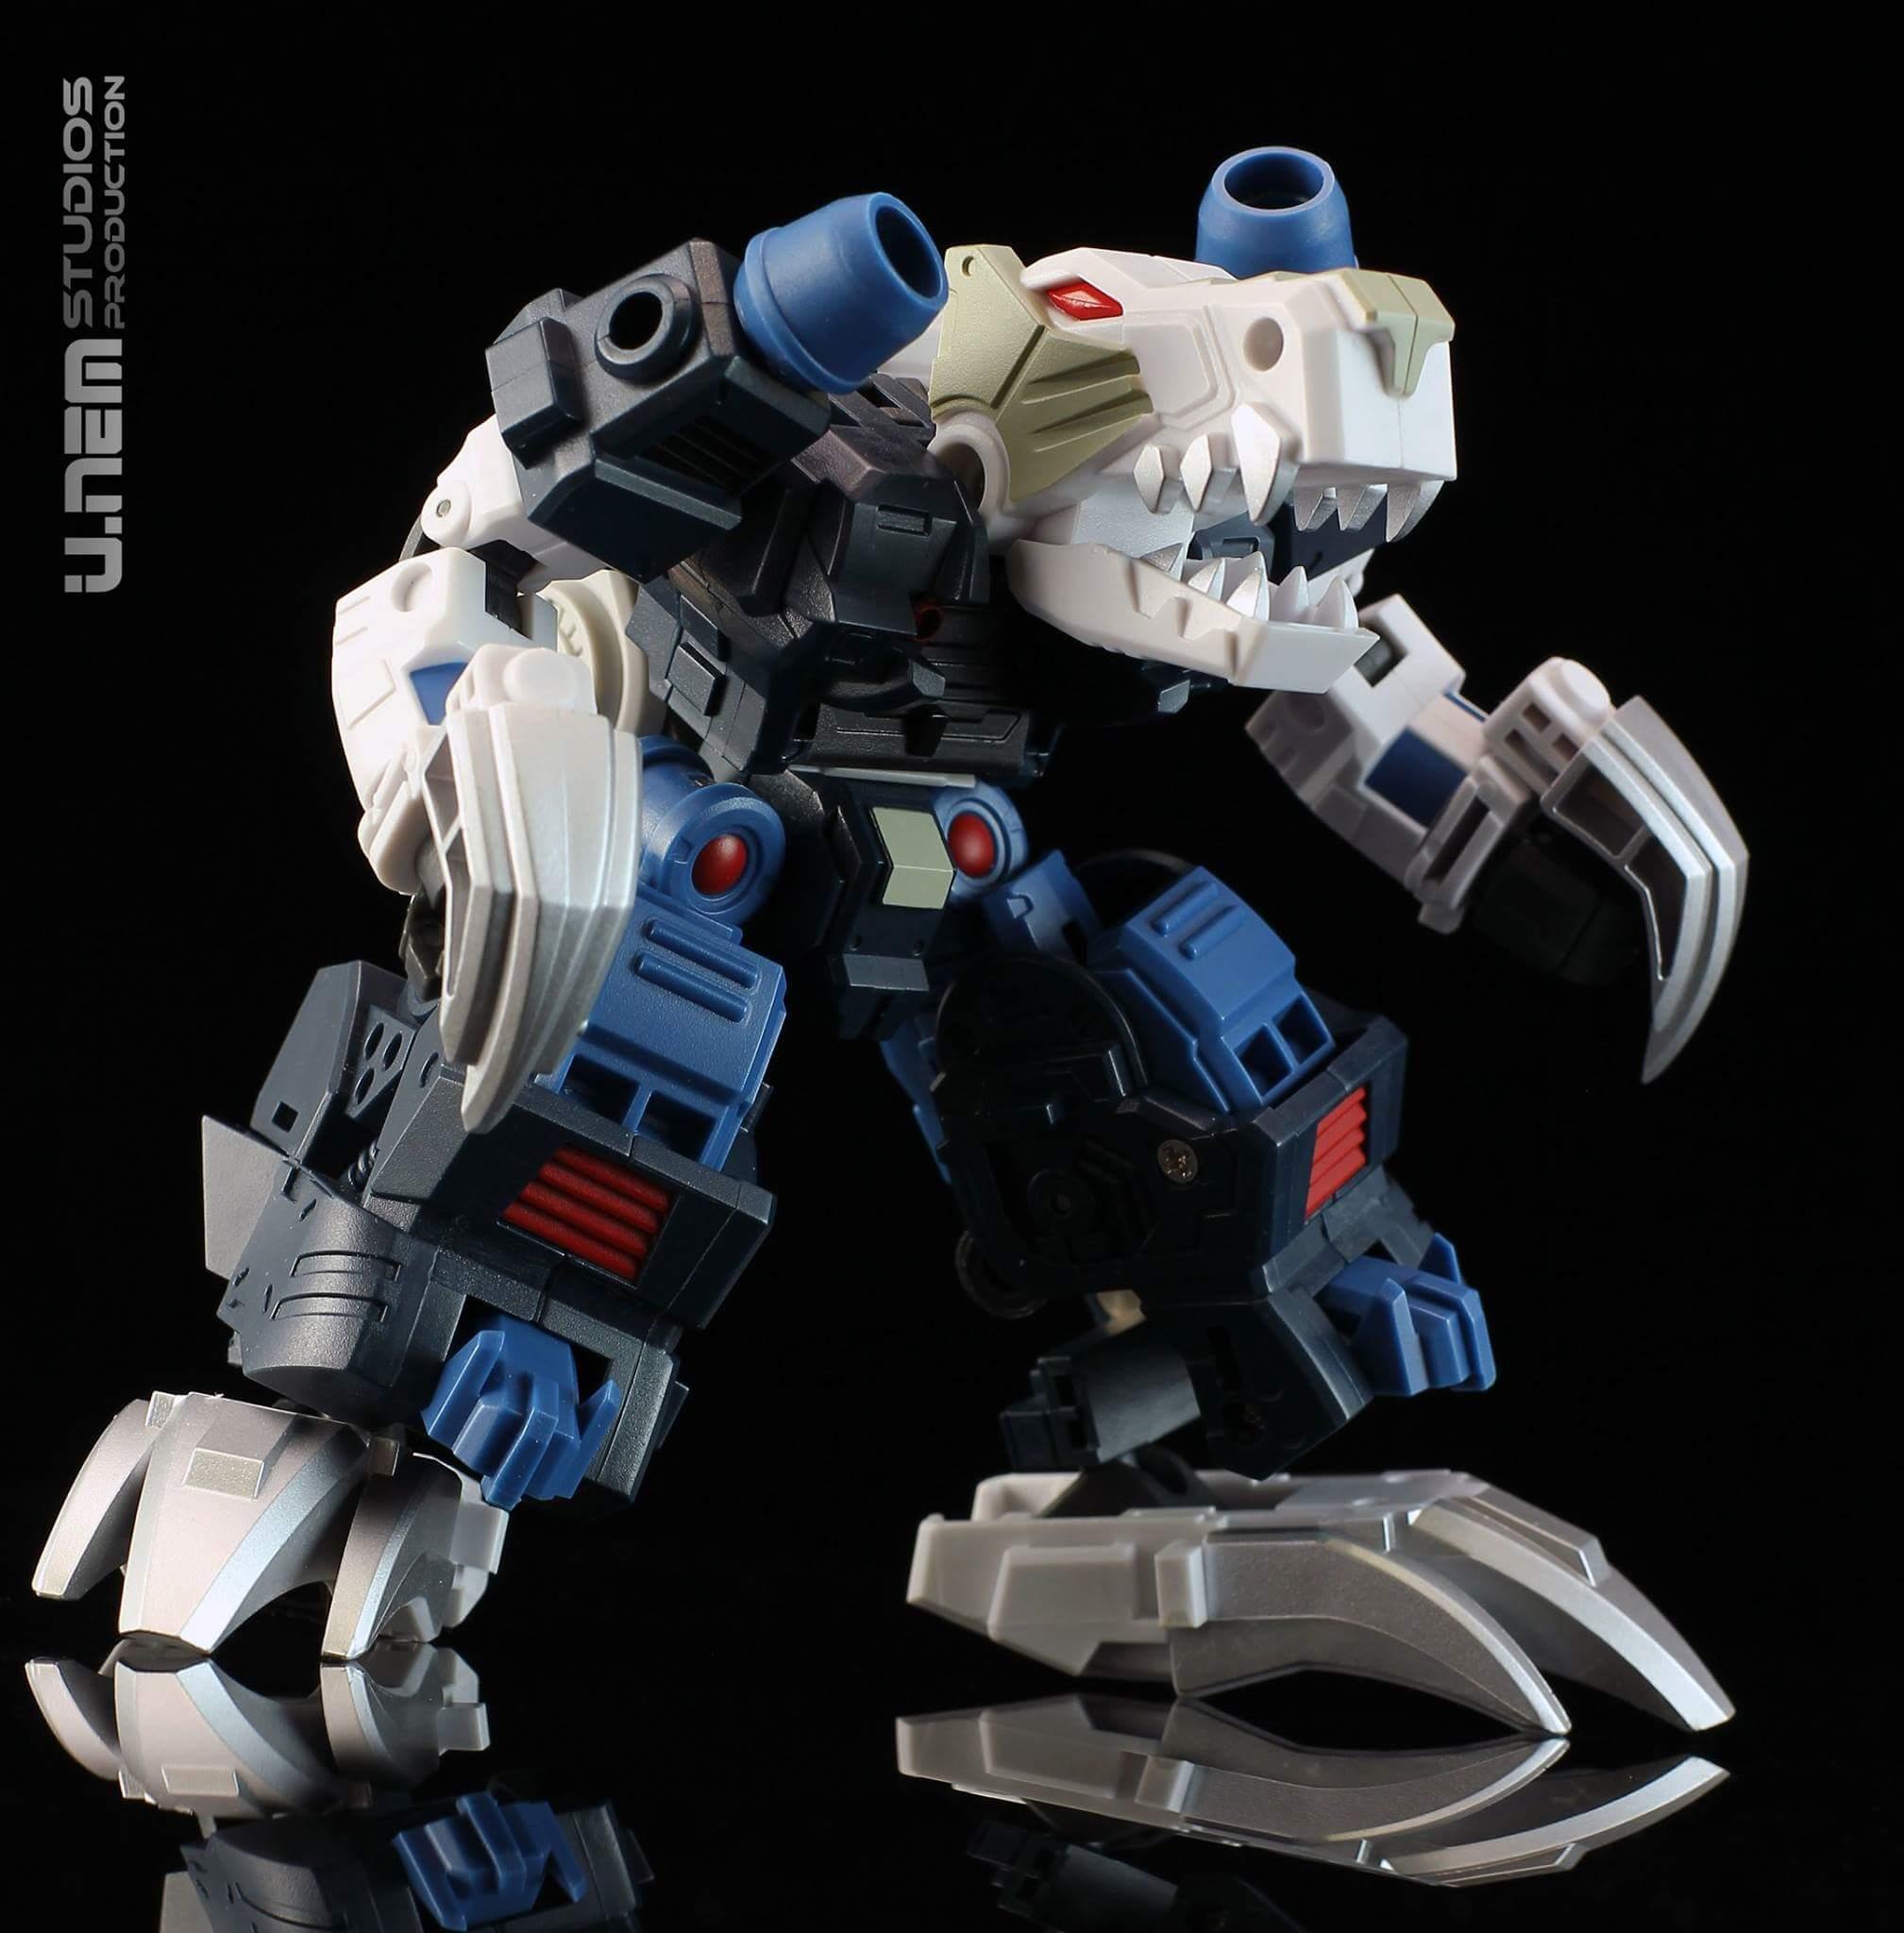 [FansProject] Produit Tiers - Jouet Saurus Ryu-oh aka Dinoking (Victory) | Monstructor (USA) - Page 3 Lvwbz2OL